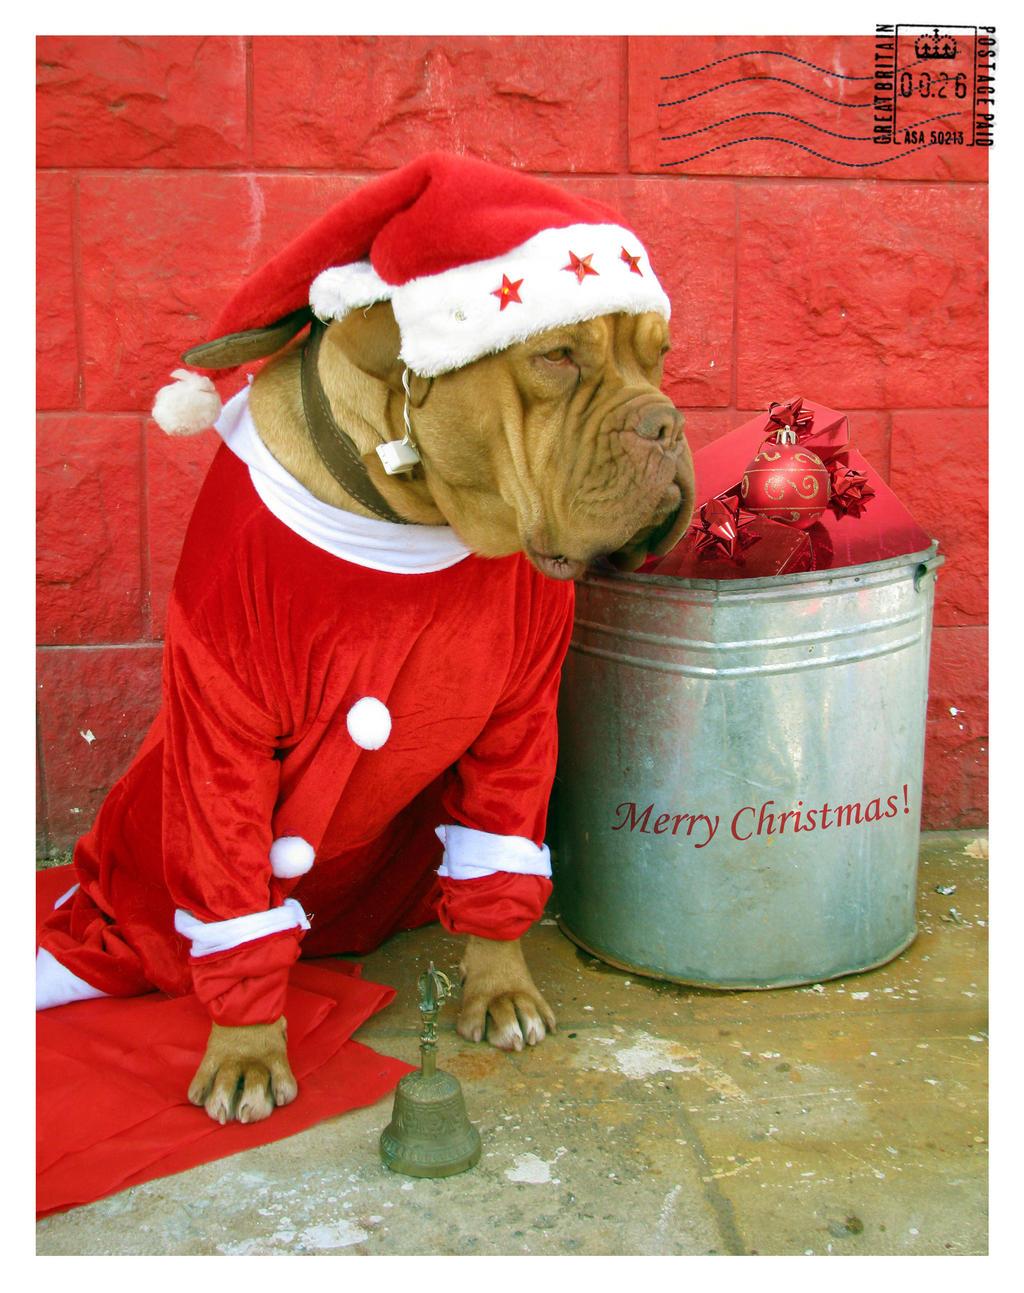 Merry Christmas by maska13